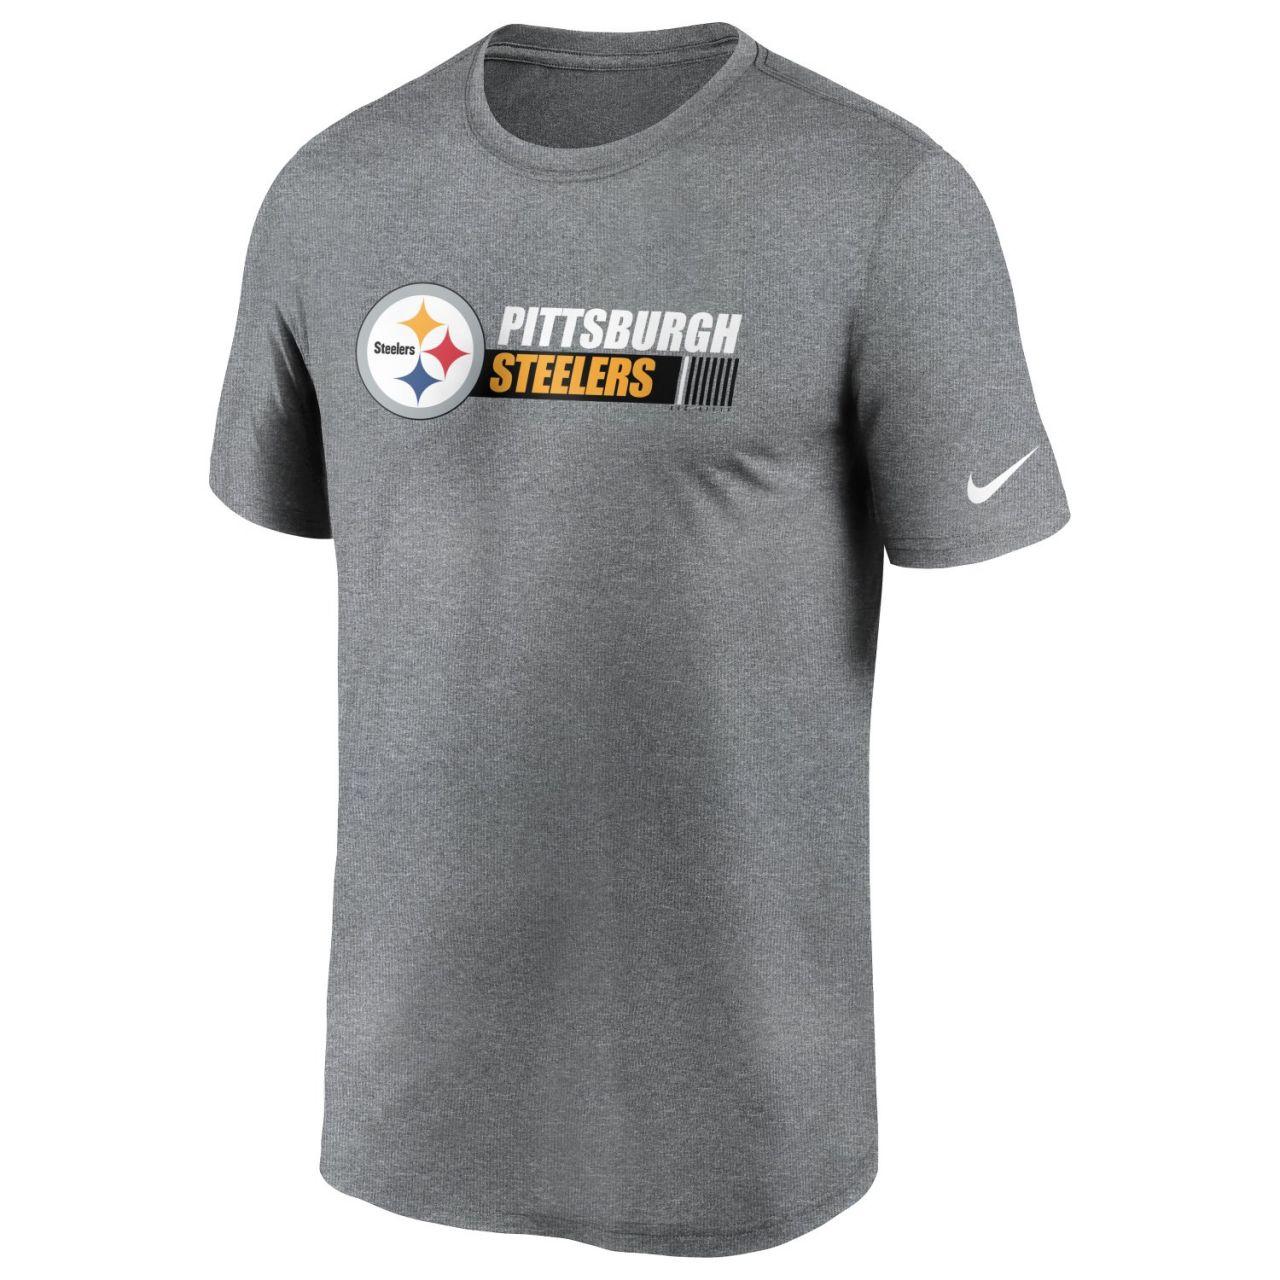 amfoo - Nike Dri-FIT Legend Shirt - PRIMETIME Pittsburgh Steelers